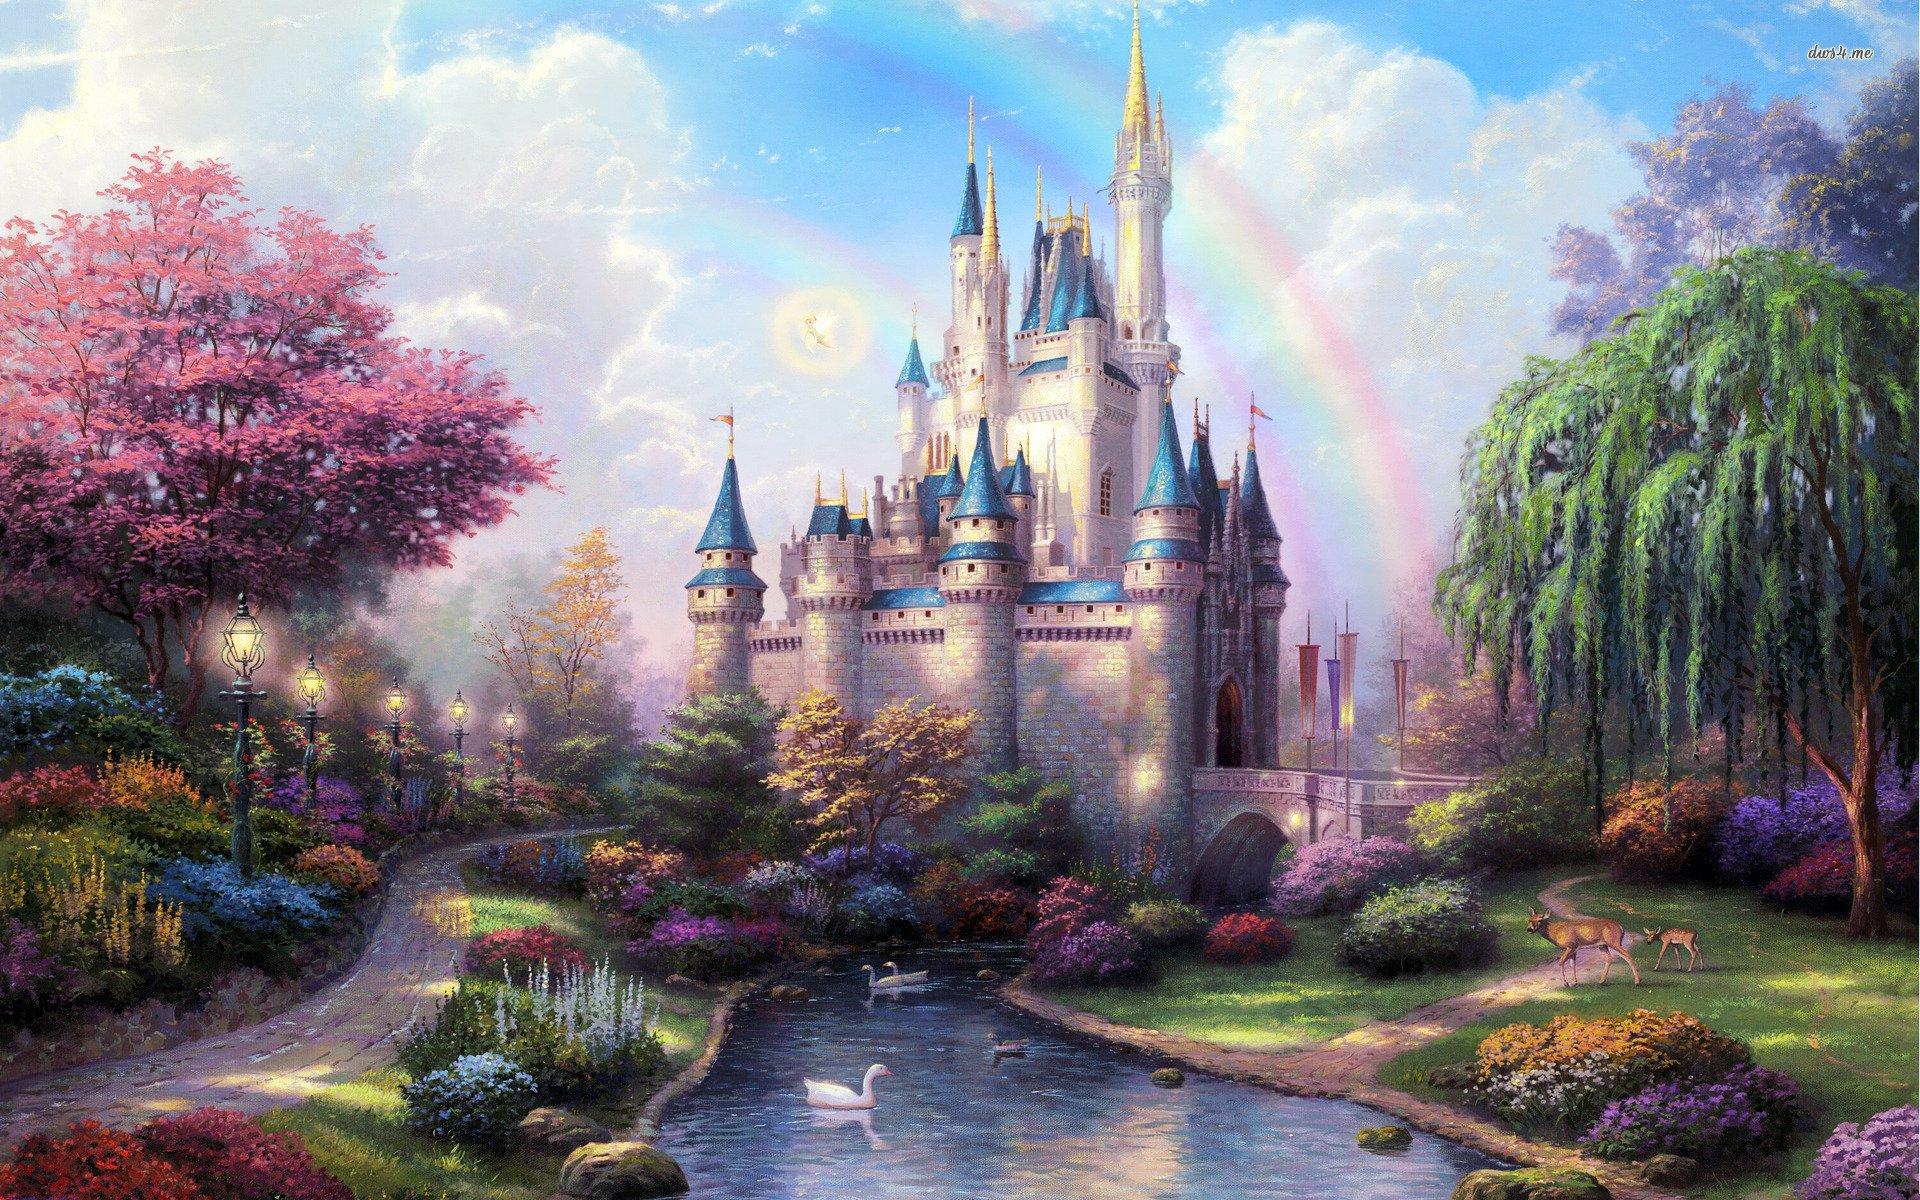 Drawn wallpaper castle Dreamy Wallpaper : 90 fantasy